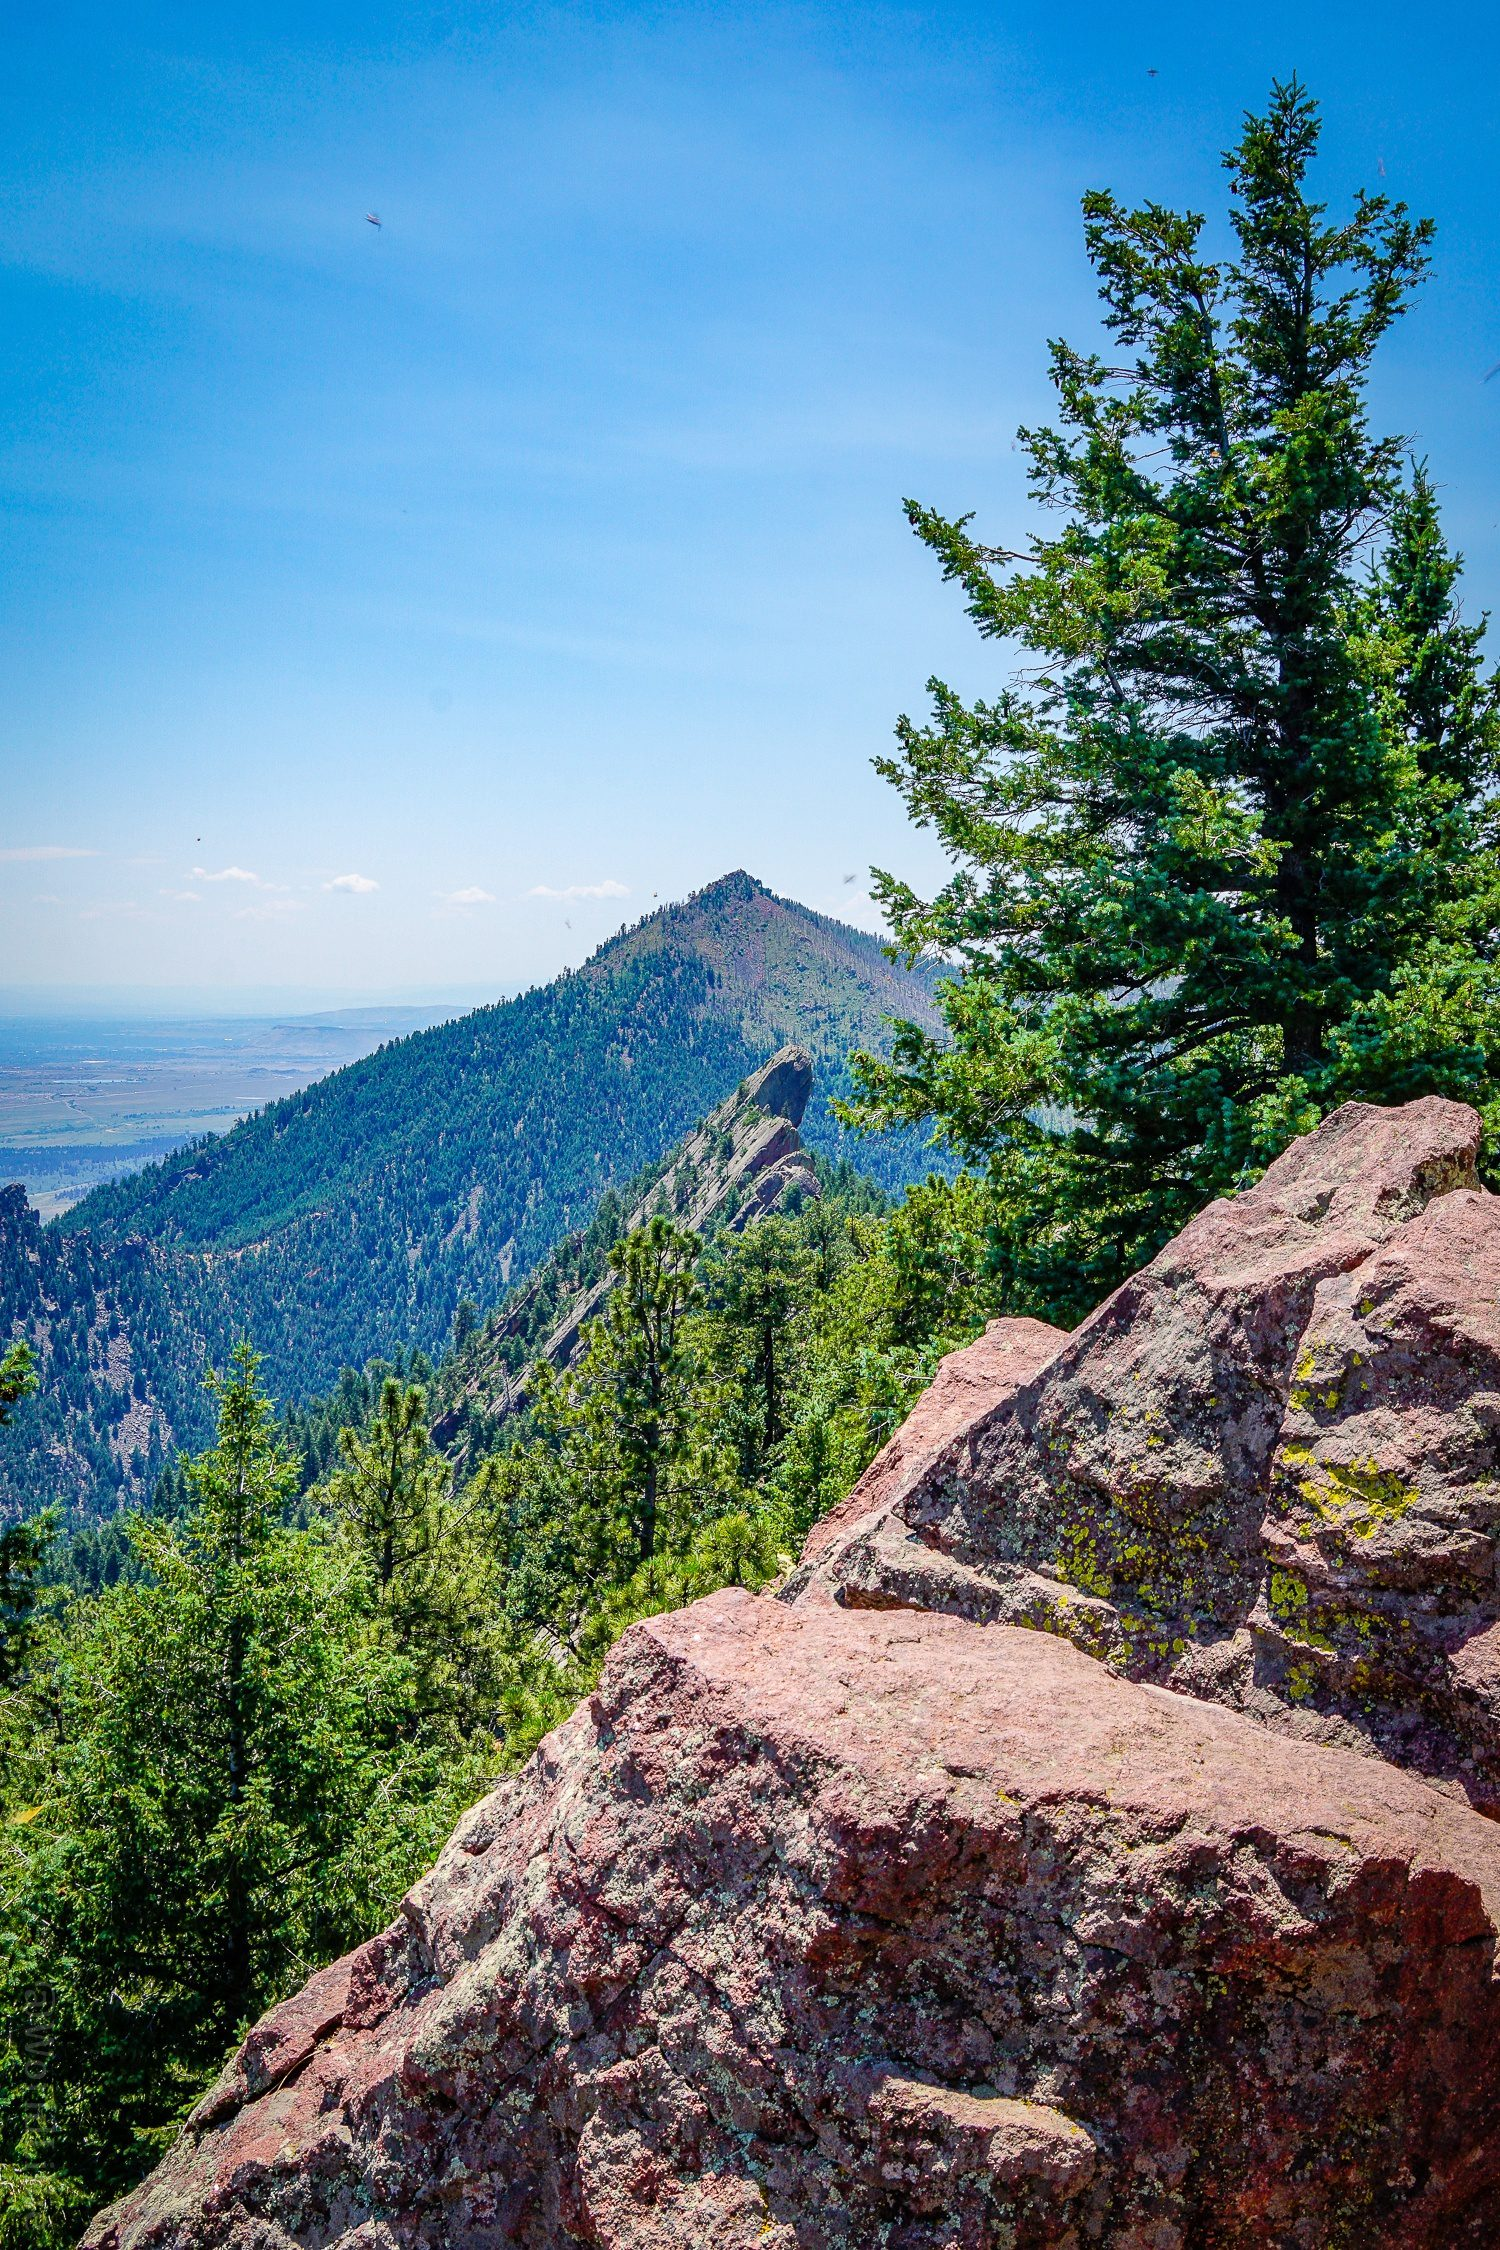 Boulder hikes overlooking the Flatiron Mountains